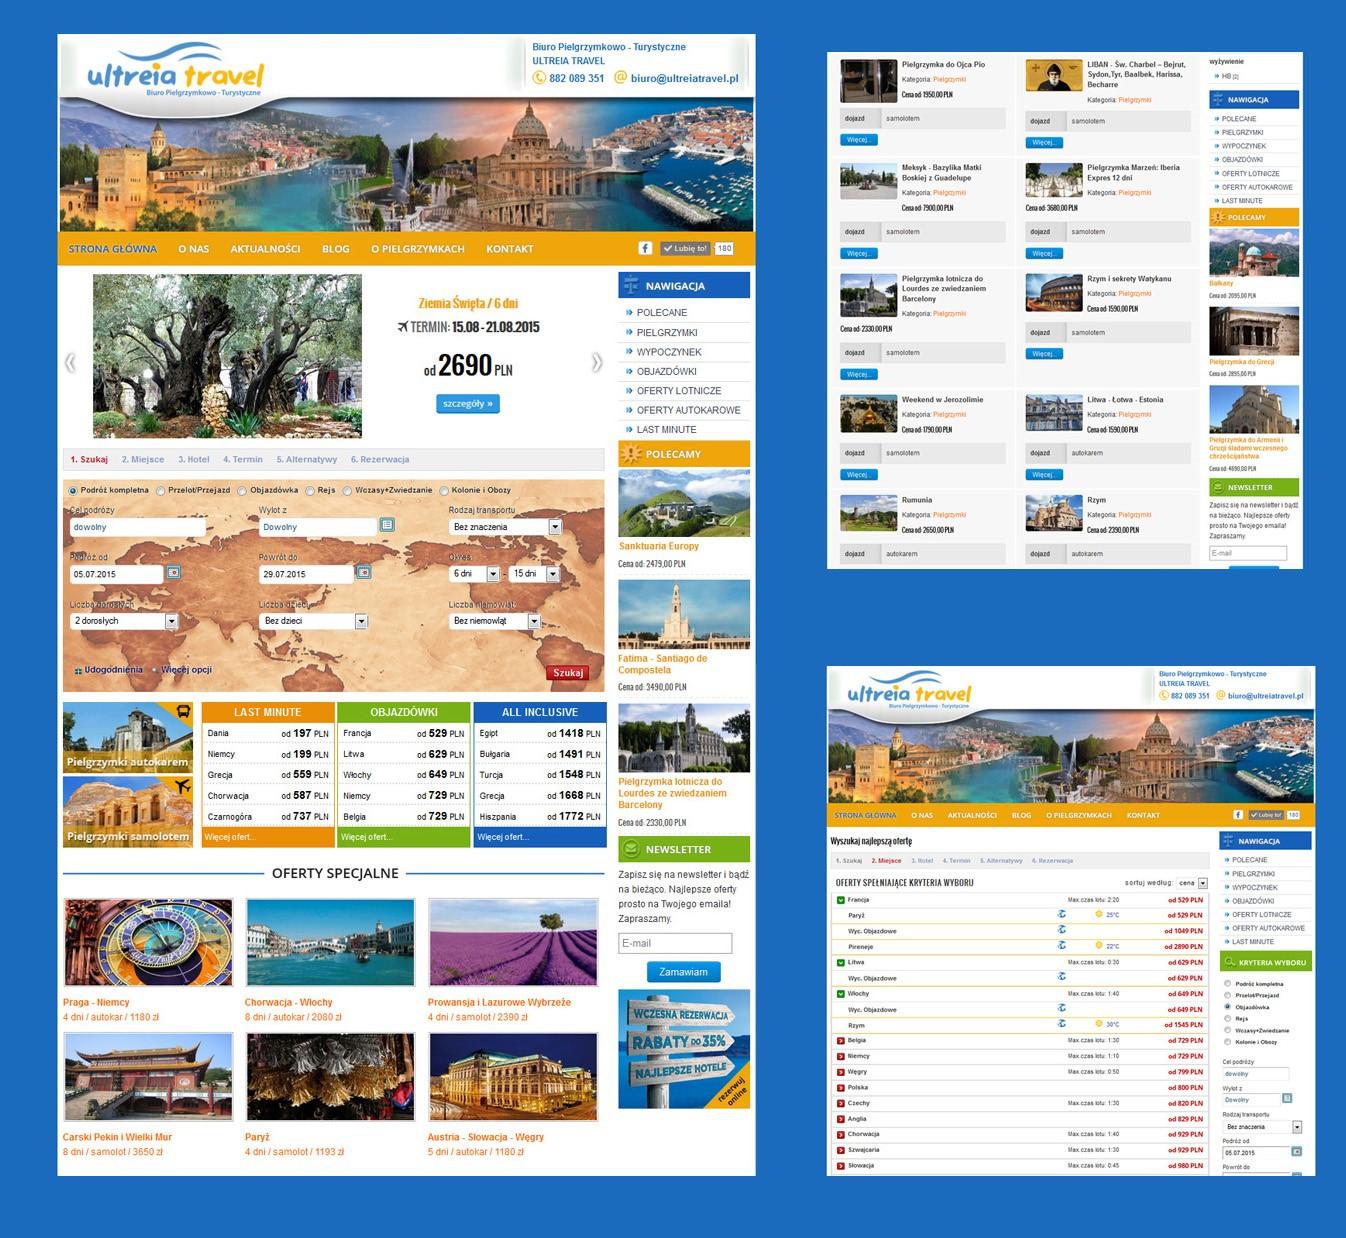 Rejse Hjemmeside<div style='clear:both;width:100%;height:0px;'></div><span class='cat'>Joomla, Rejse hjemmesider</span>